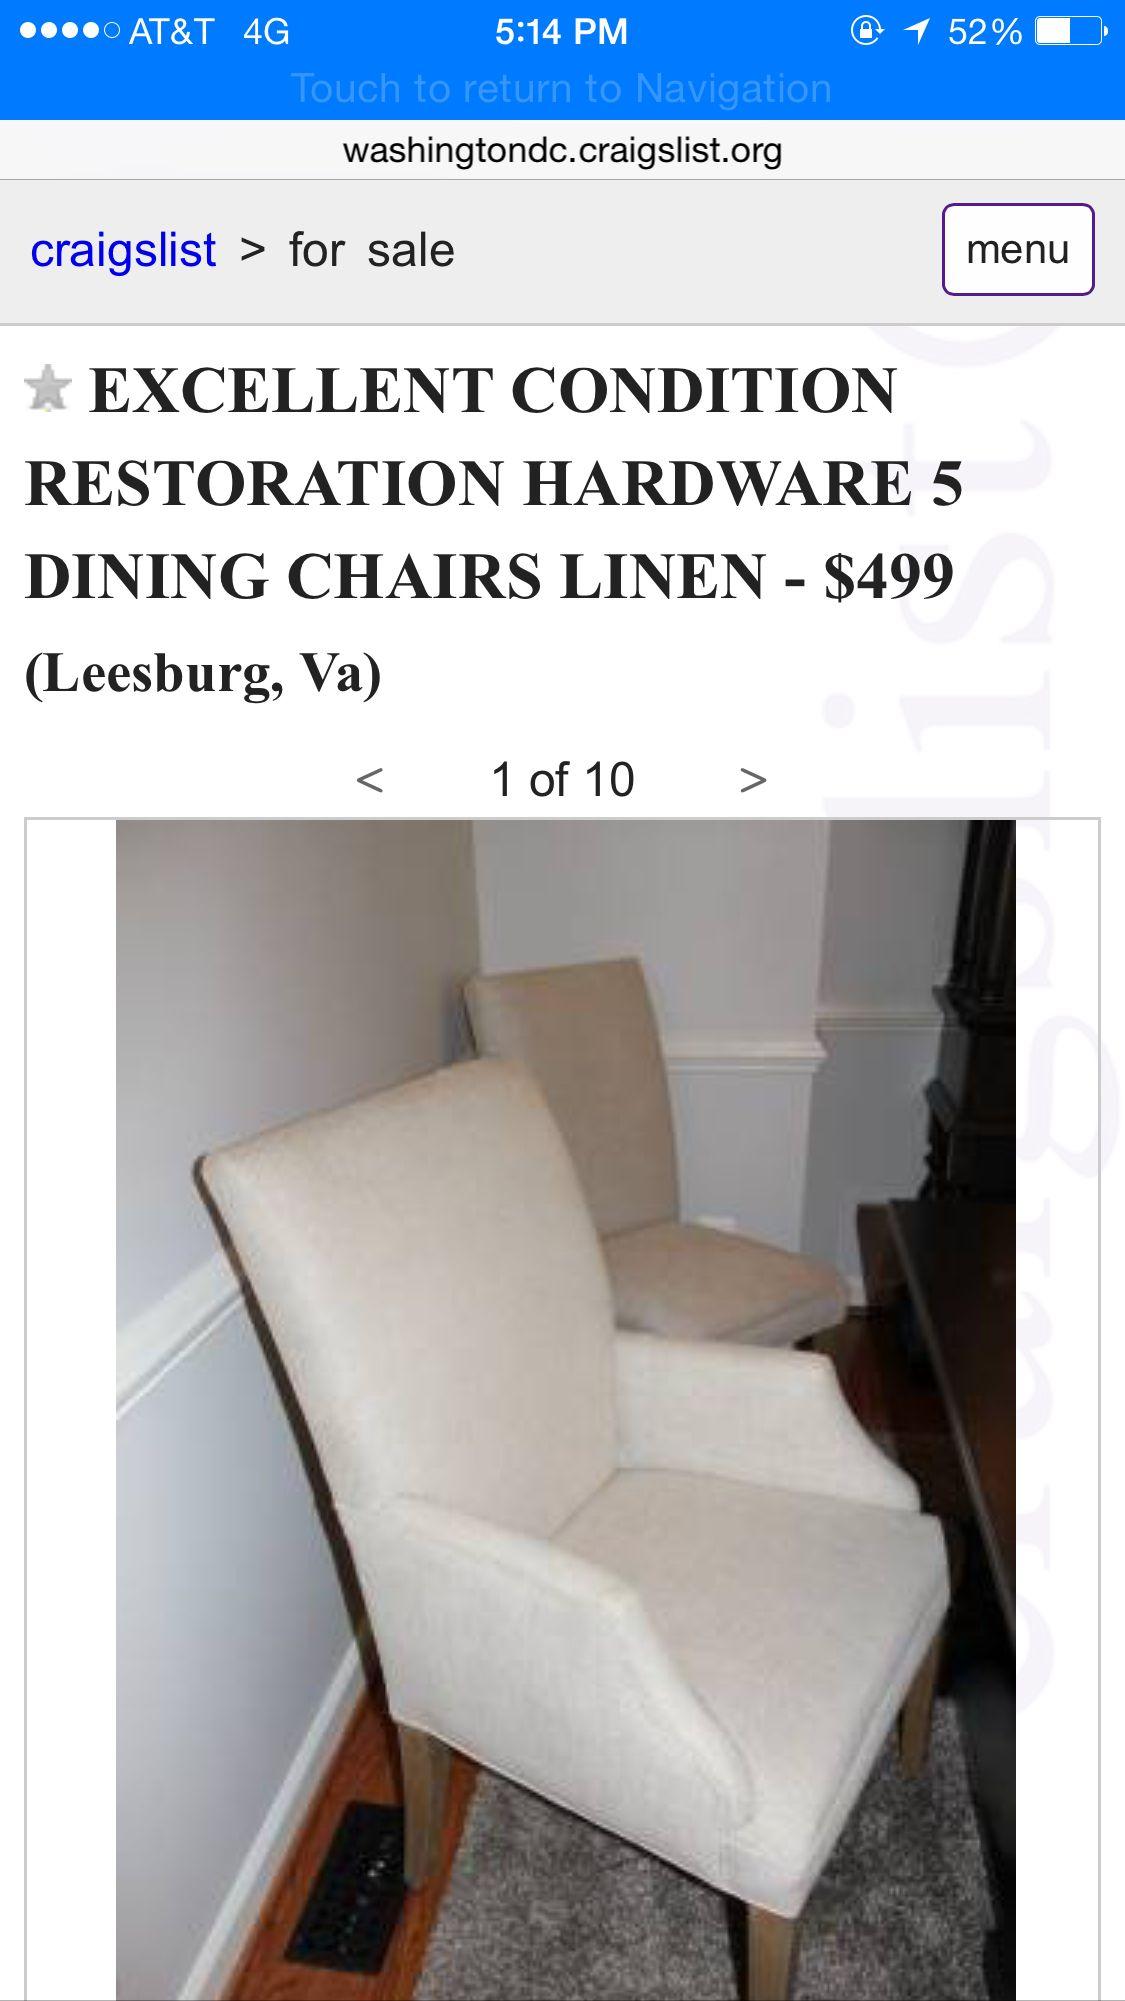 Https Washingtondc Craigslist Org Nva Hsh 5130946913 Html Dining Chairs